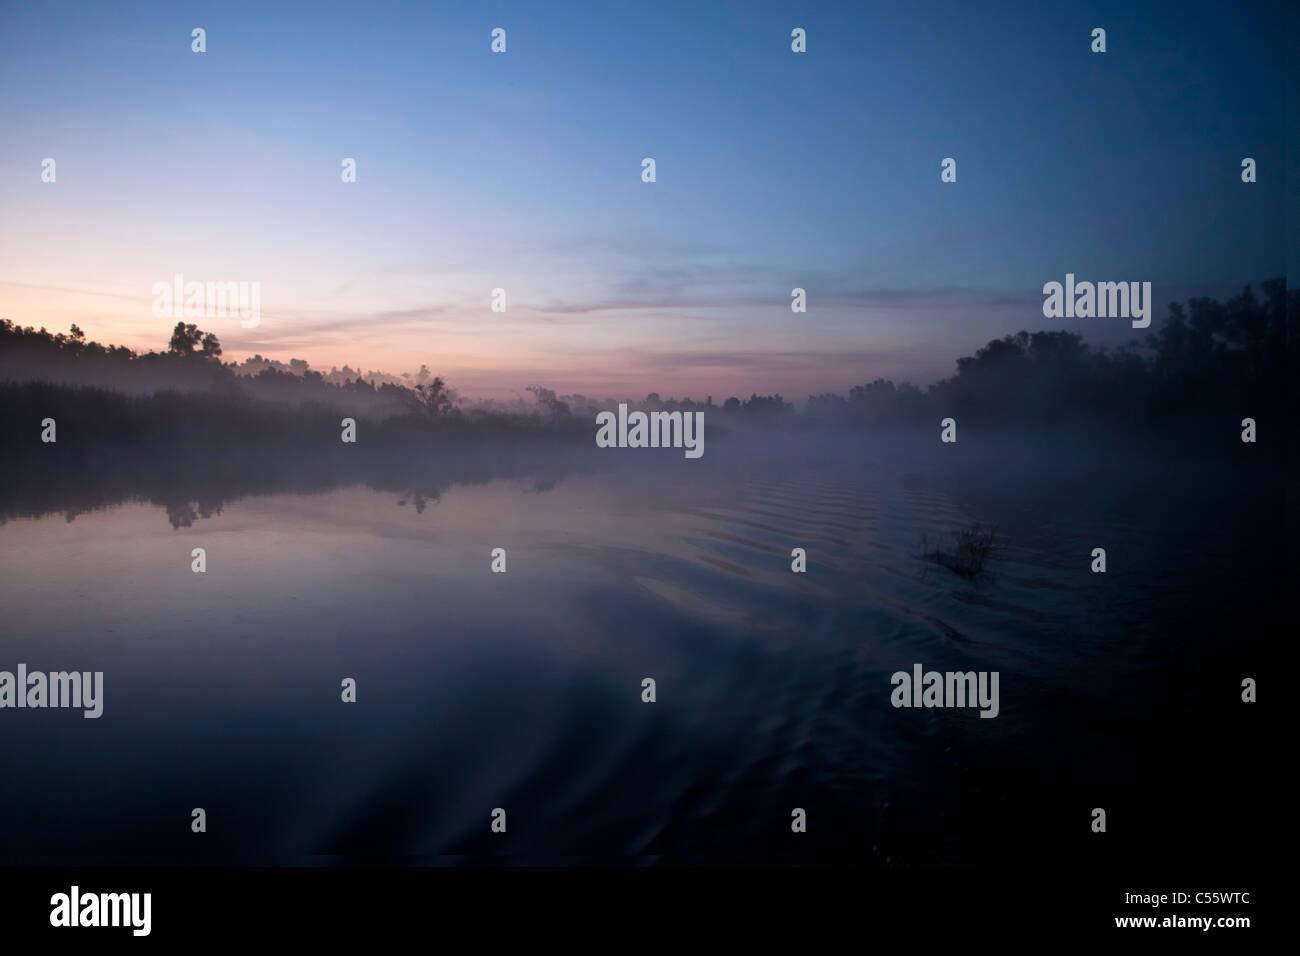 The Netherlands, Werkendam, De Biesbosch national park. Landscape at sunrise. - Stock Image